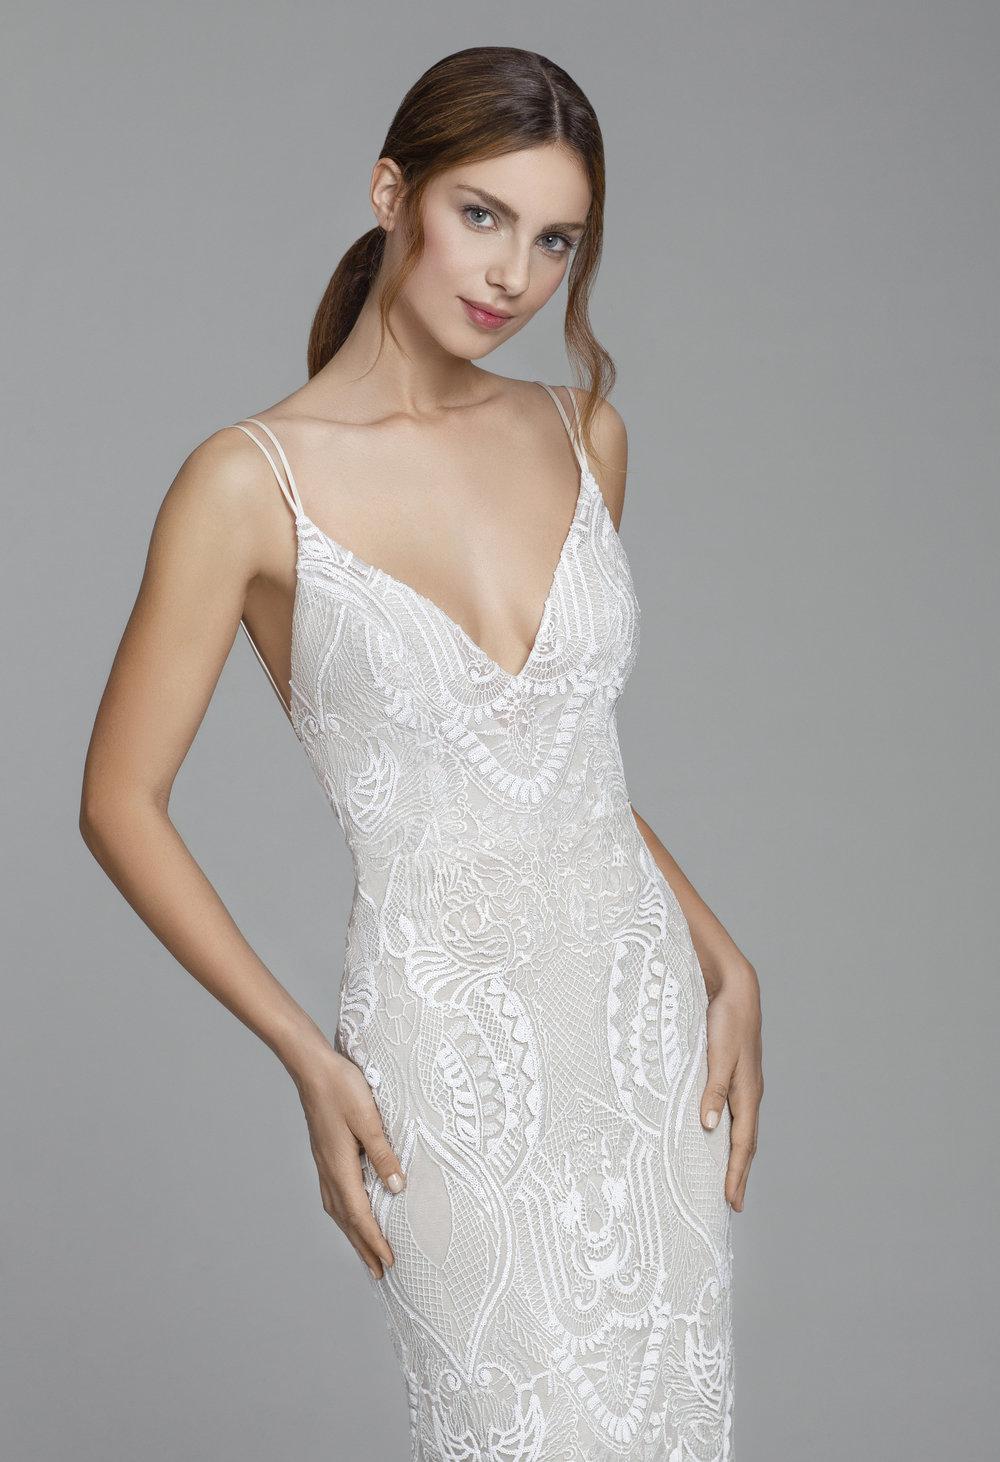 Style 2855: Rosalina